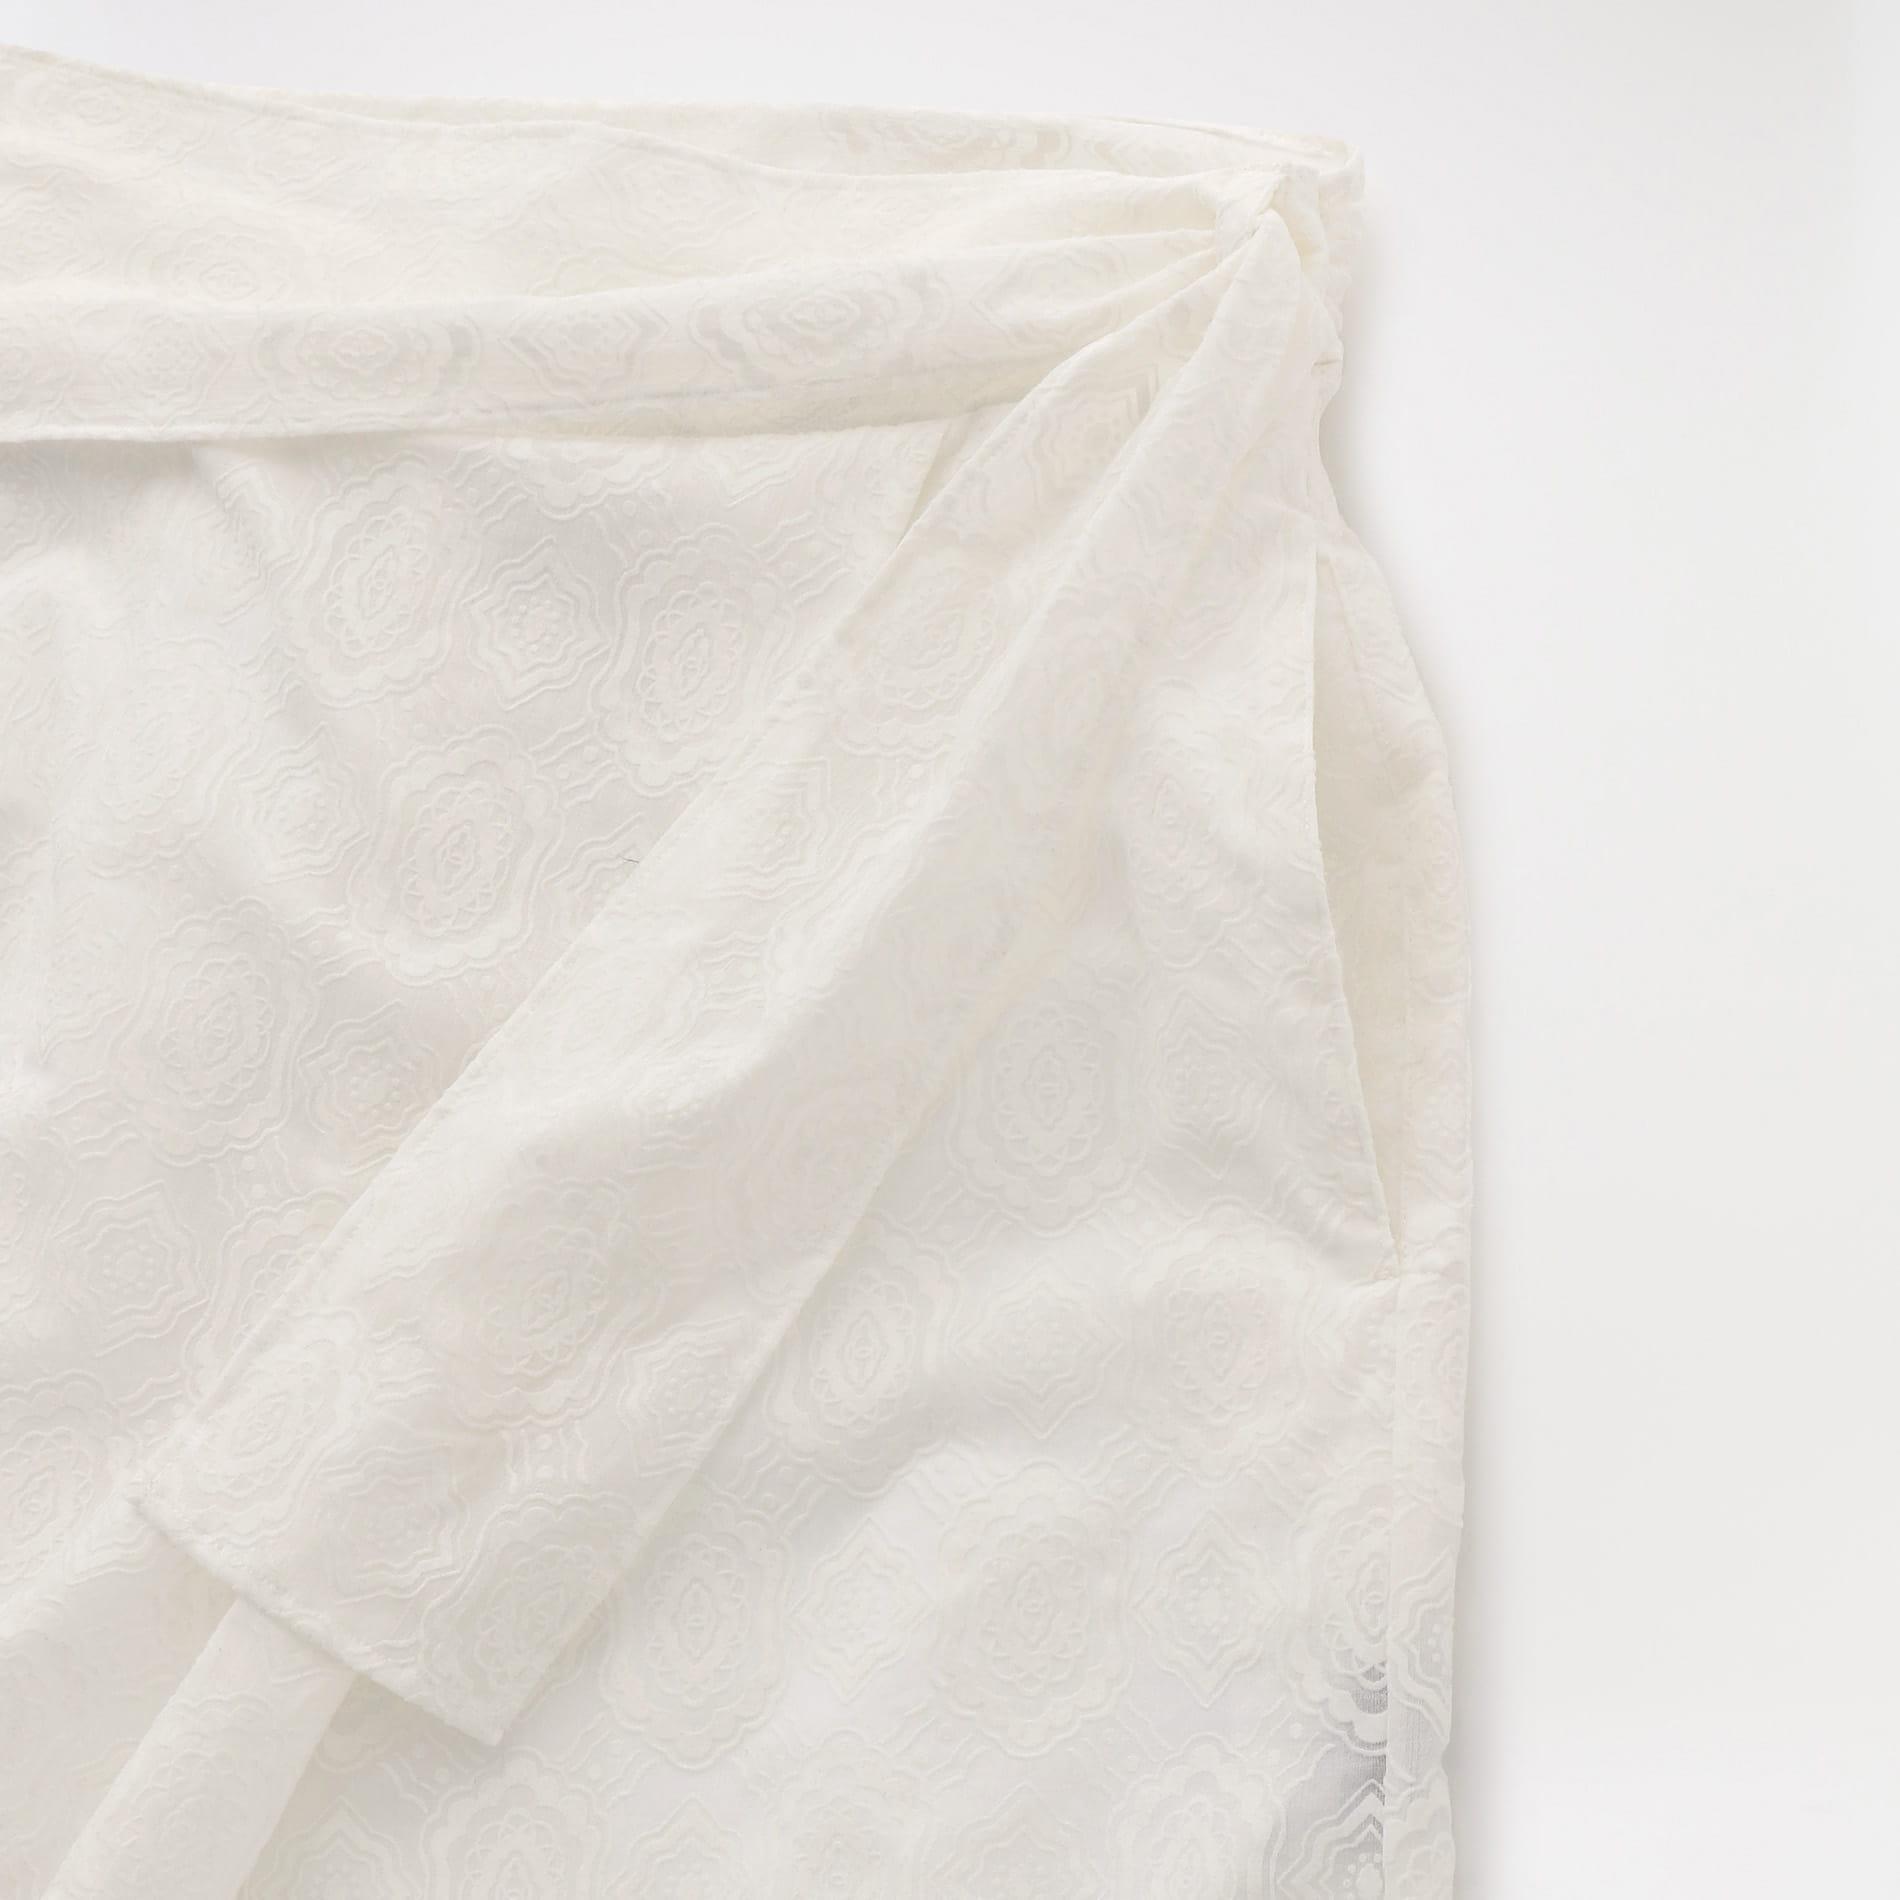 【yuumi ARIA】WOMEN ORIGINAL FLOCKY PRINT SKIRT PANTS 201-AP011